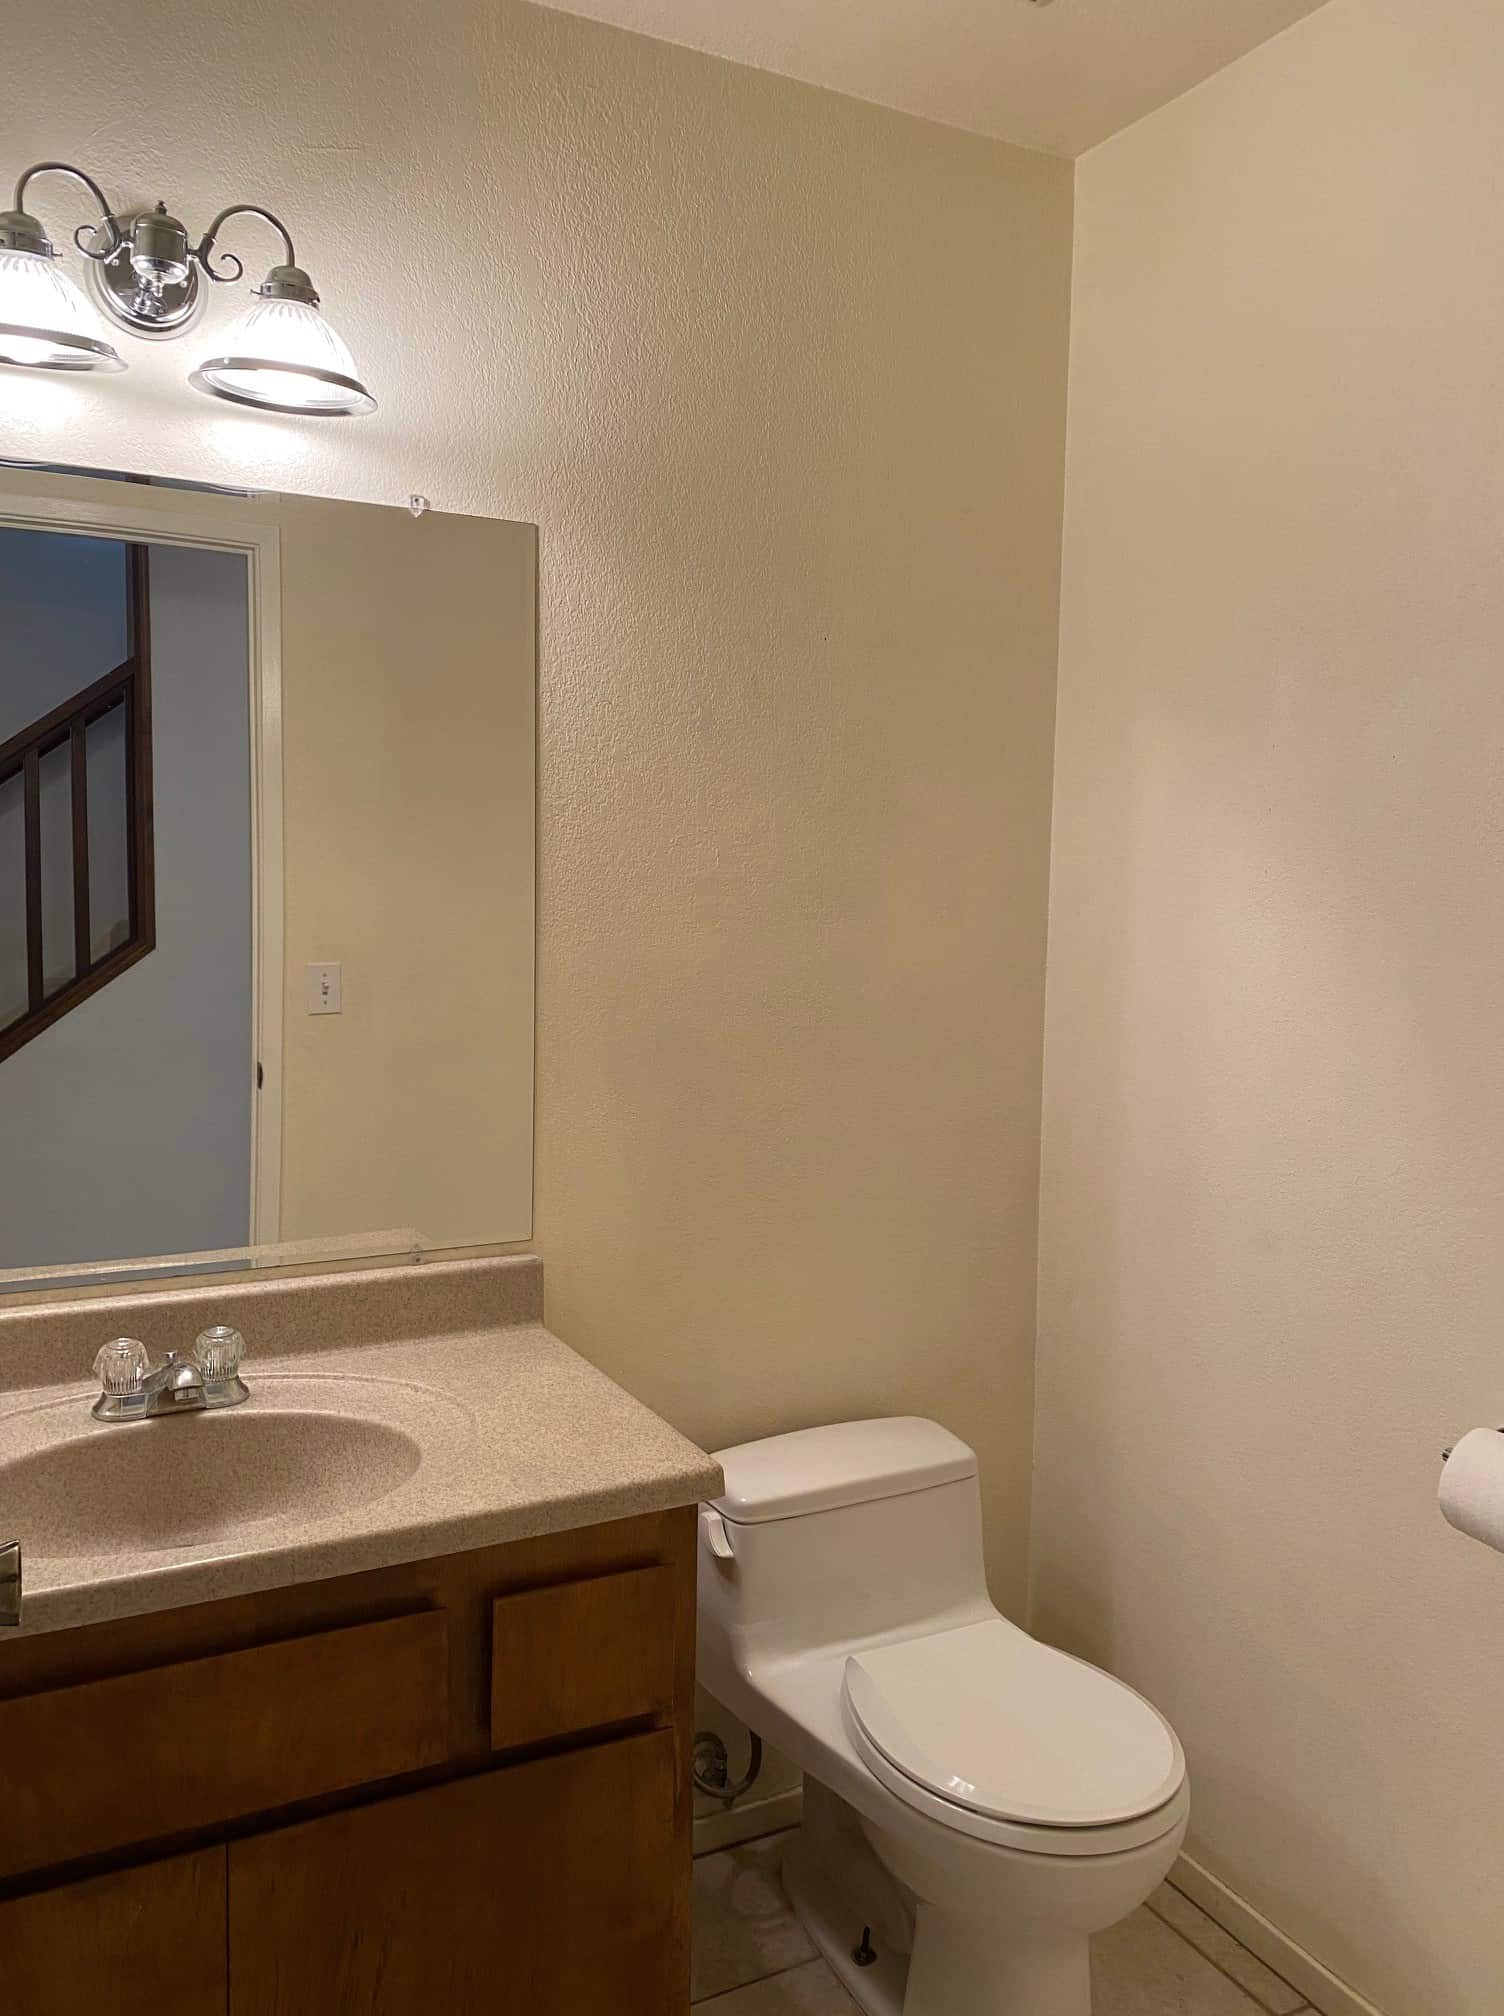 2801 Johnson #6 Downstairs bathroom